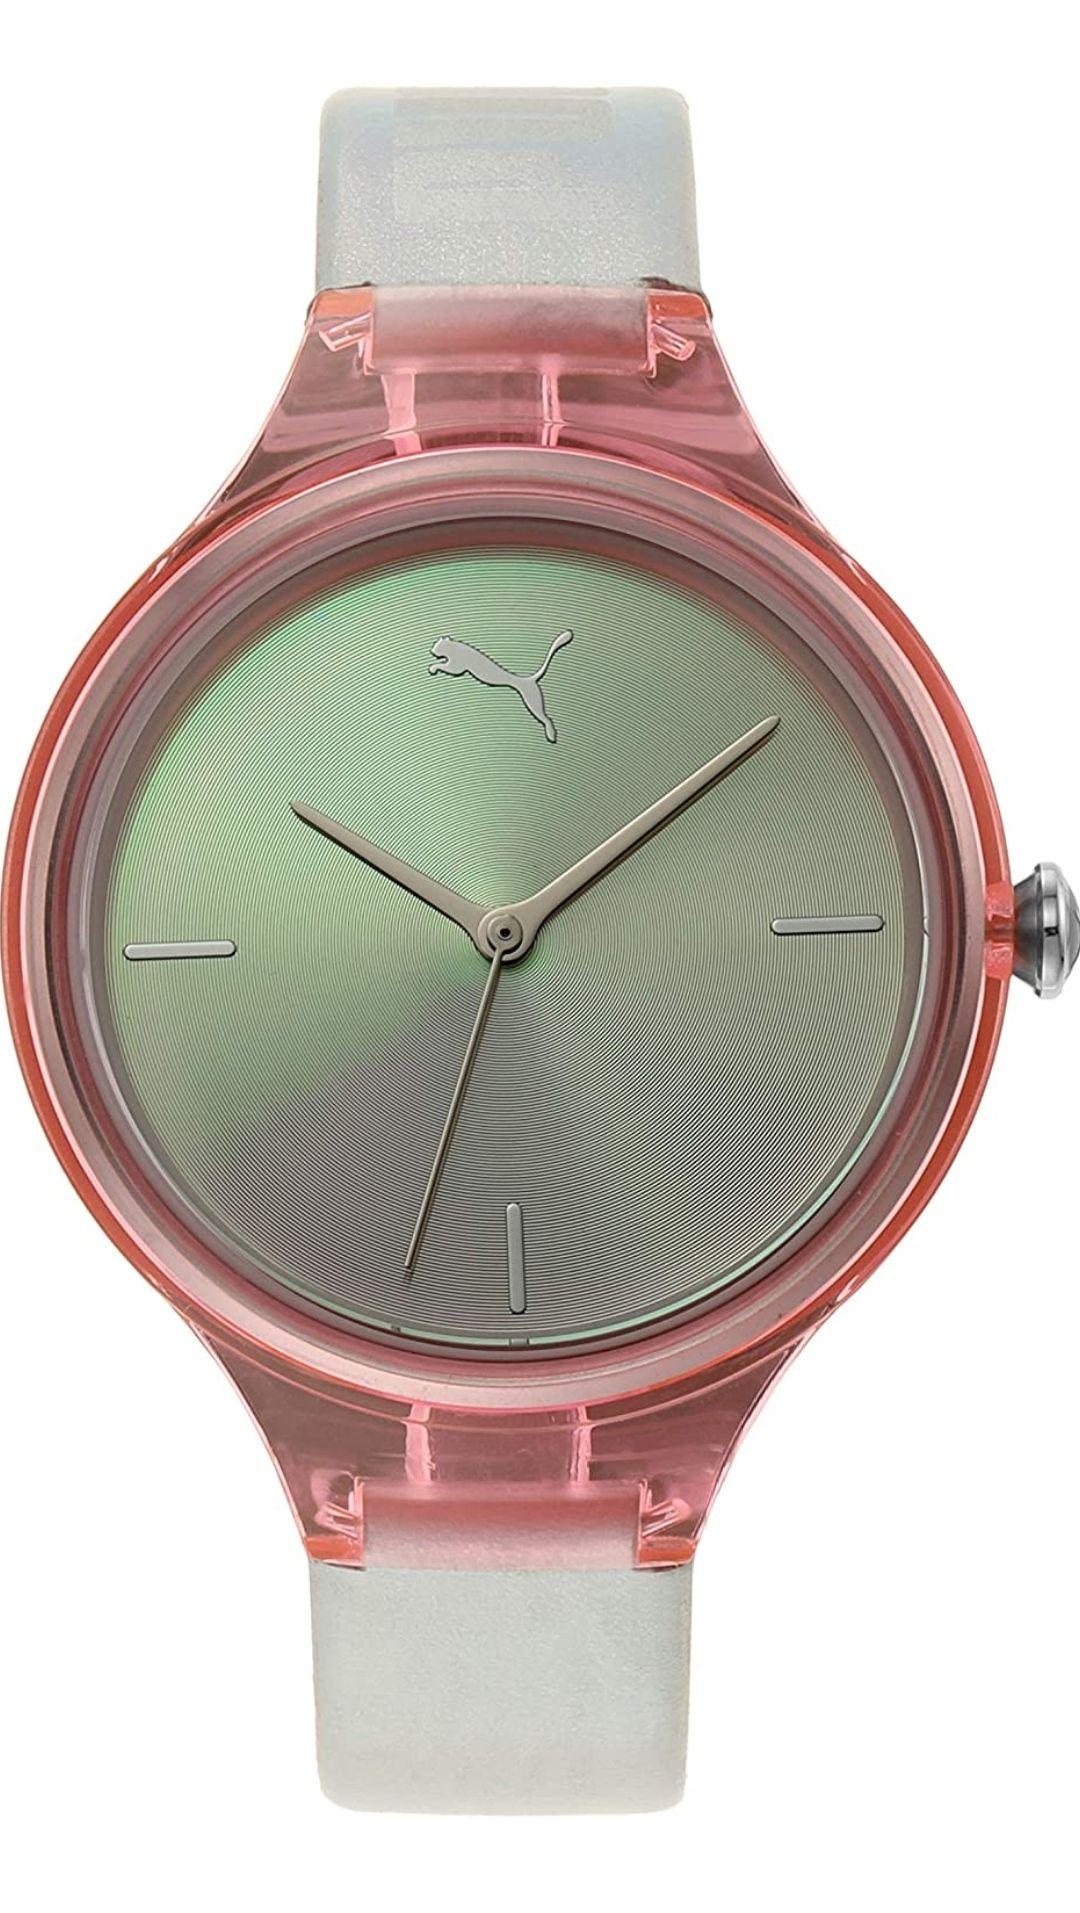 Amazon: Reloj Puma P1030 Contour para Dama